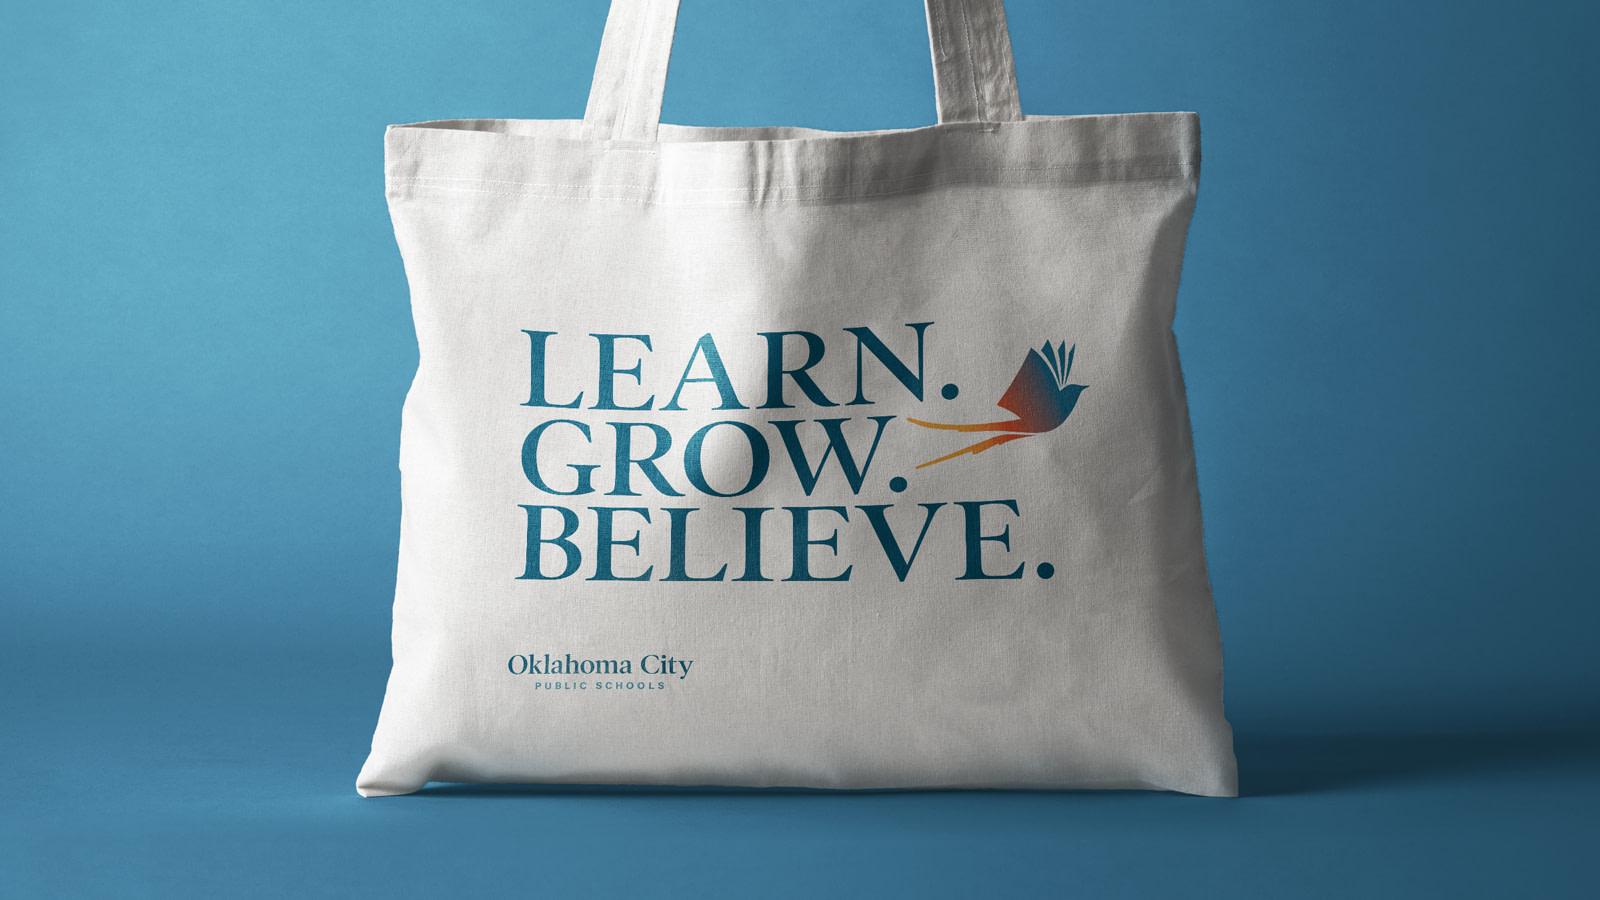 Oklahoma City Public Schools new brand tote bag design